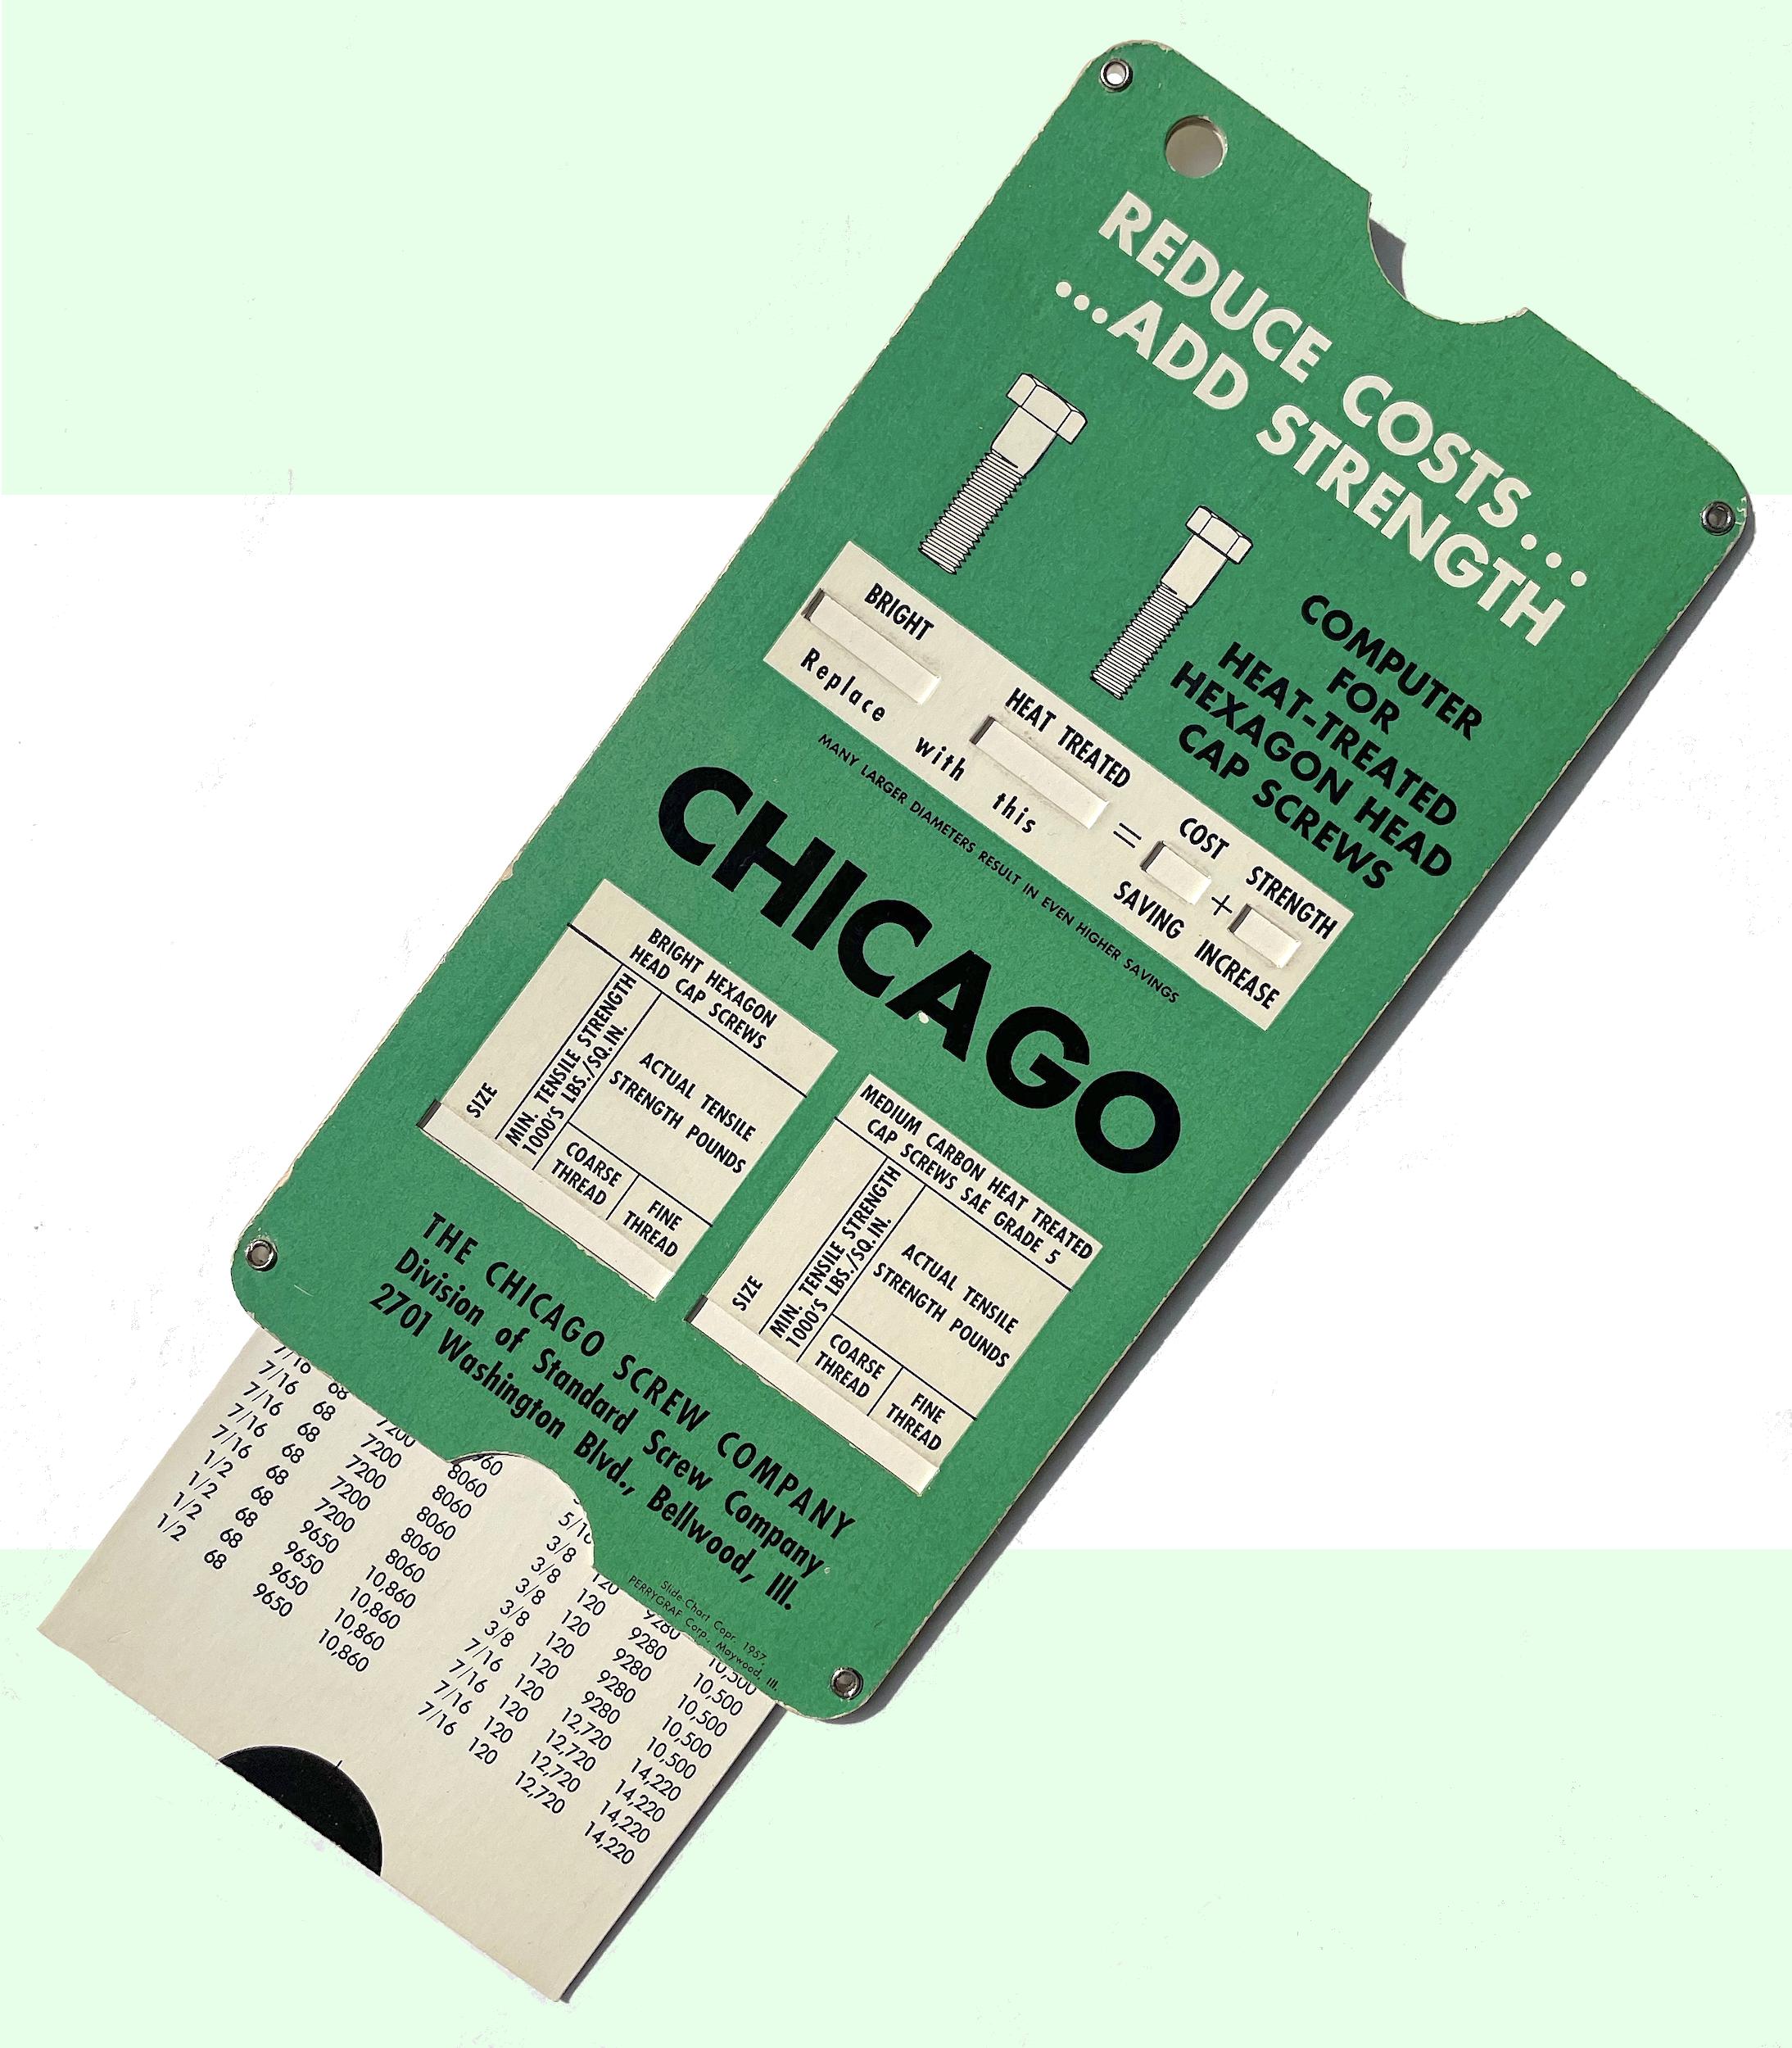 Chicago Screw Company history